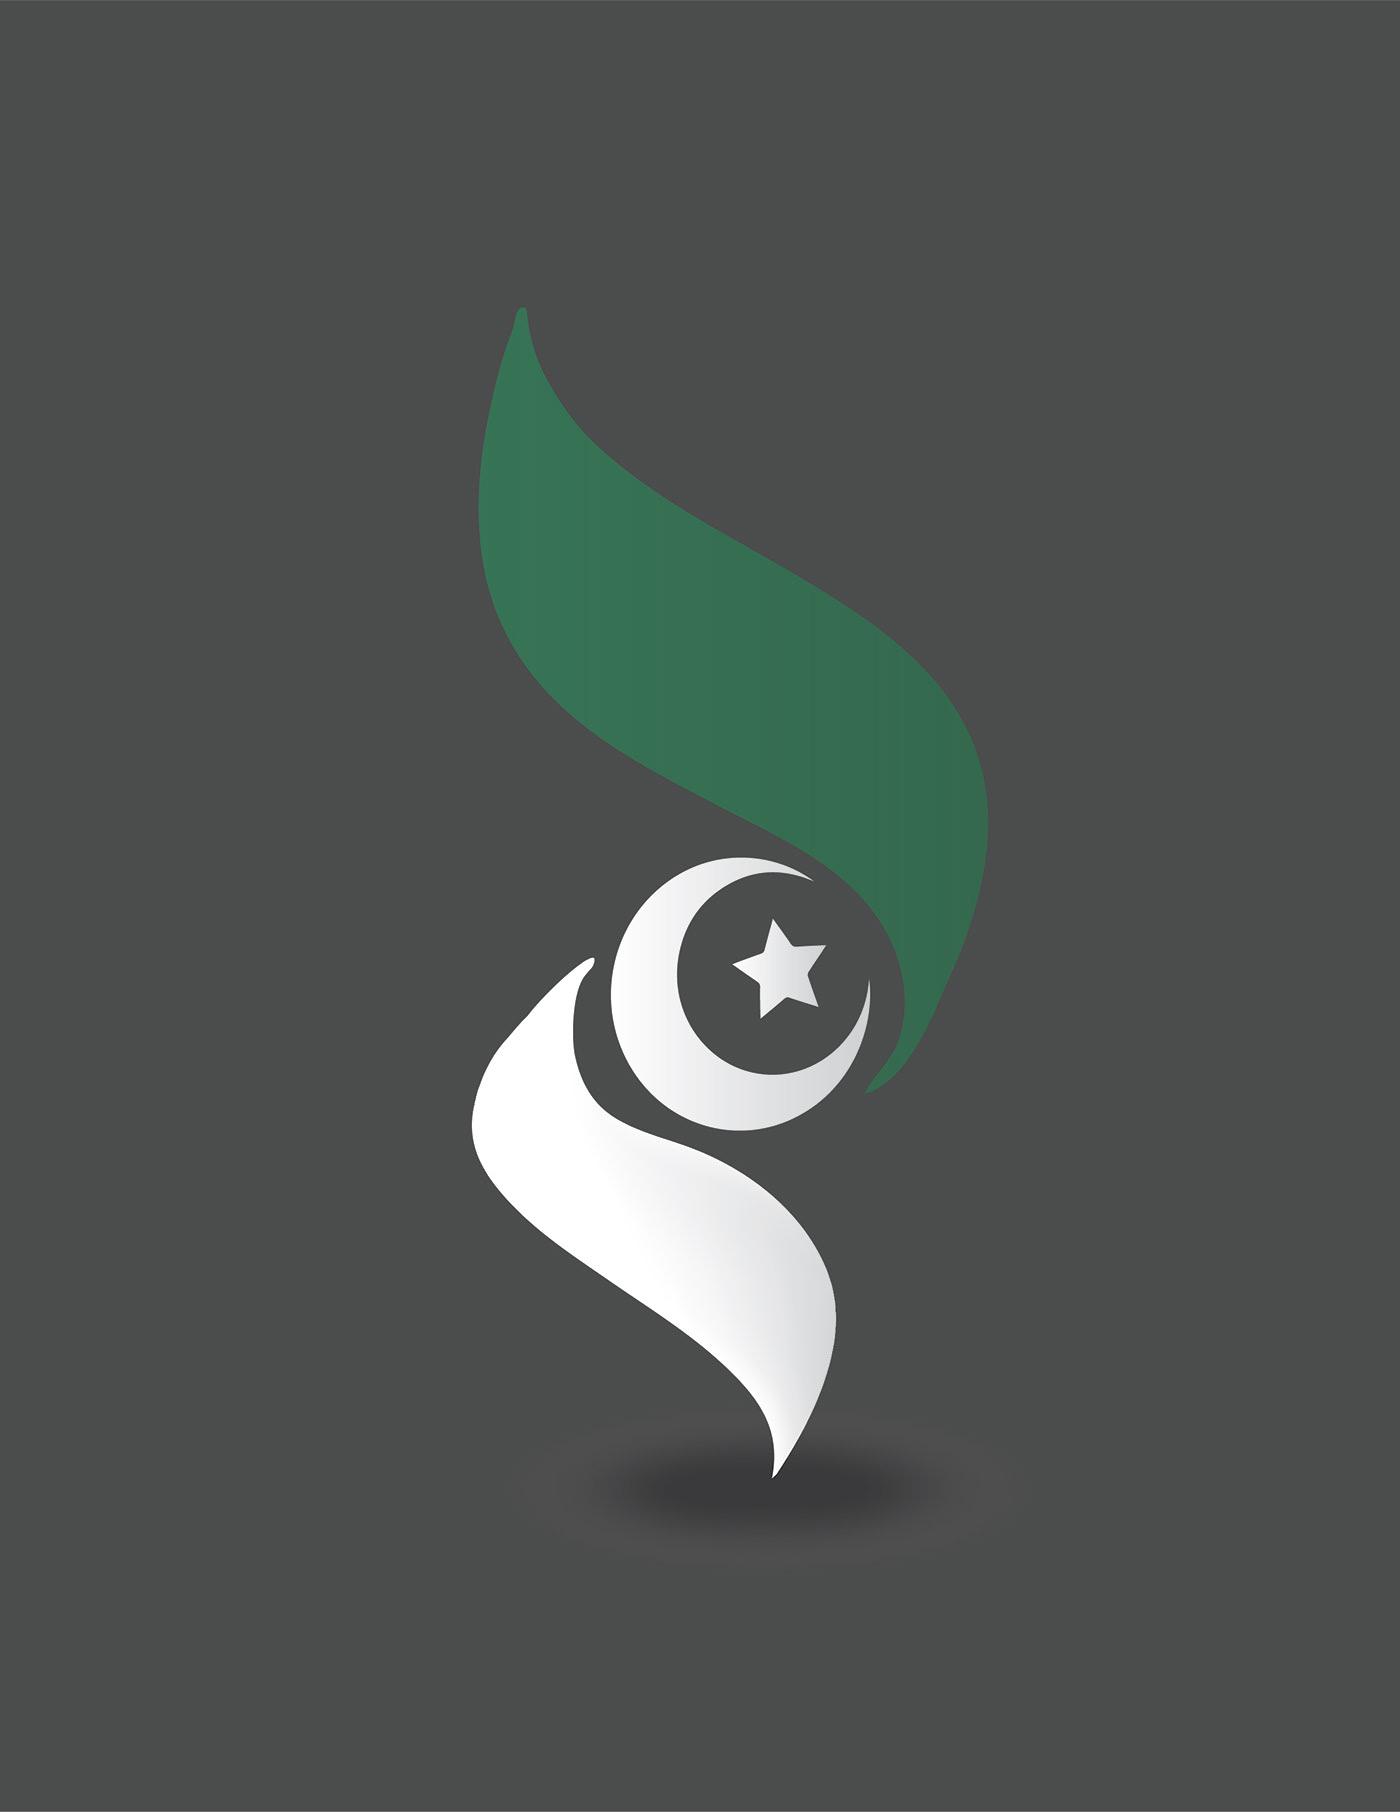 Pakistan Flag Free Download on Behance